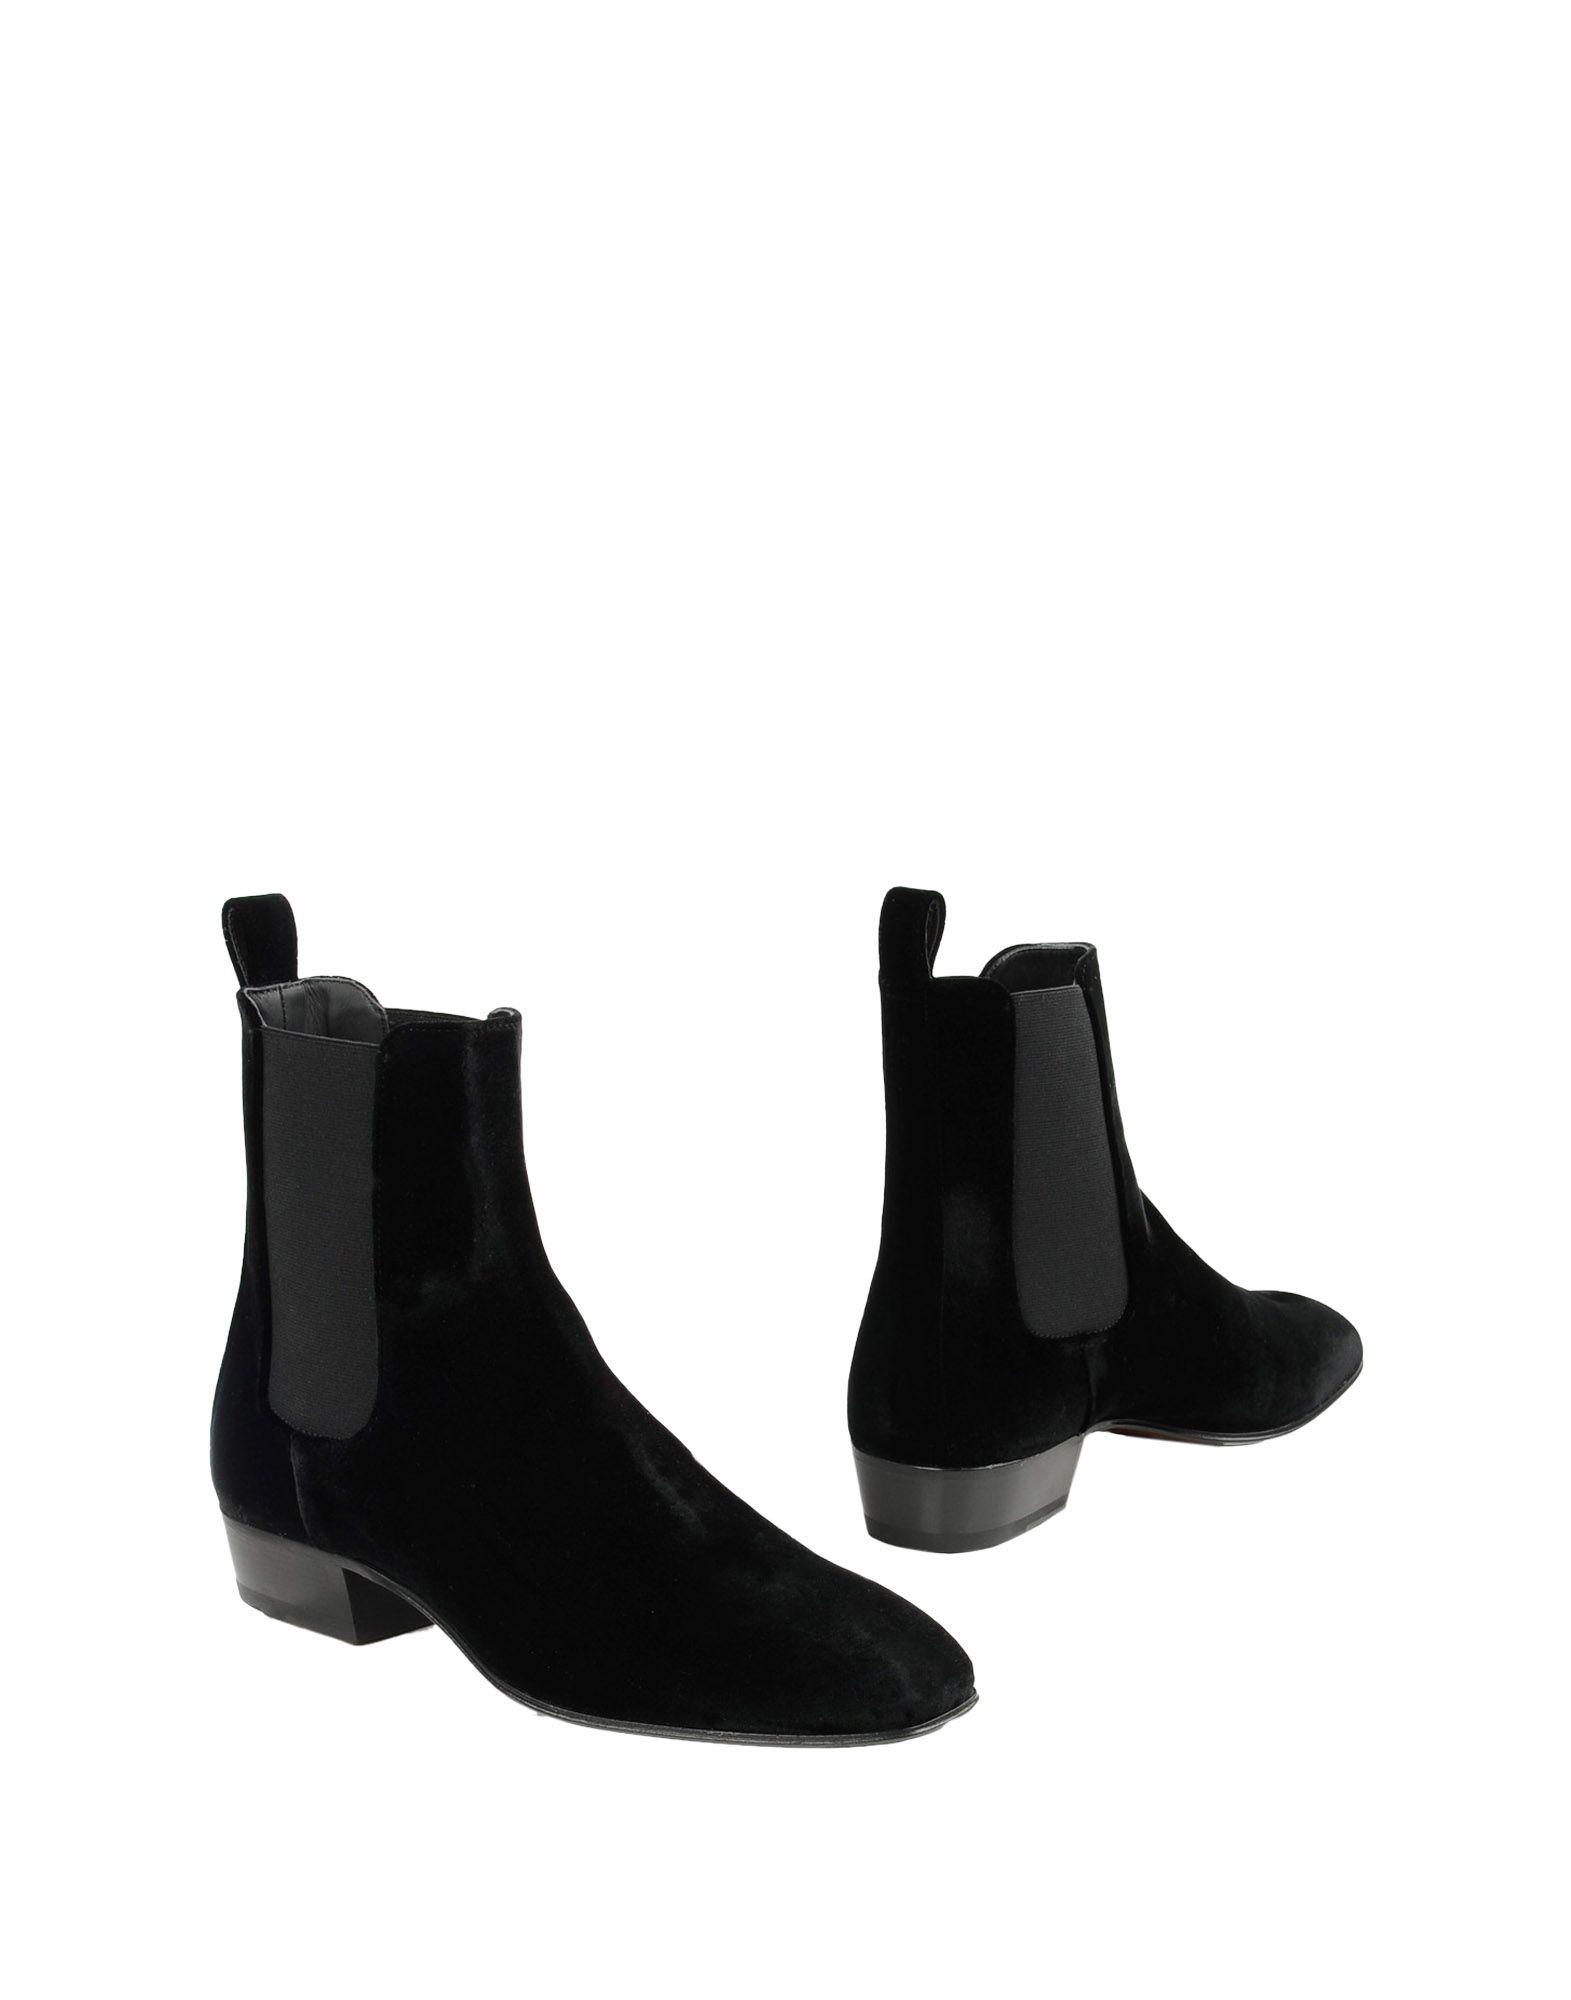 Represent Velour Men Boots - Boots - Men Velour Represent Boots online on  Australia - 11372239MK 0fc87f